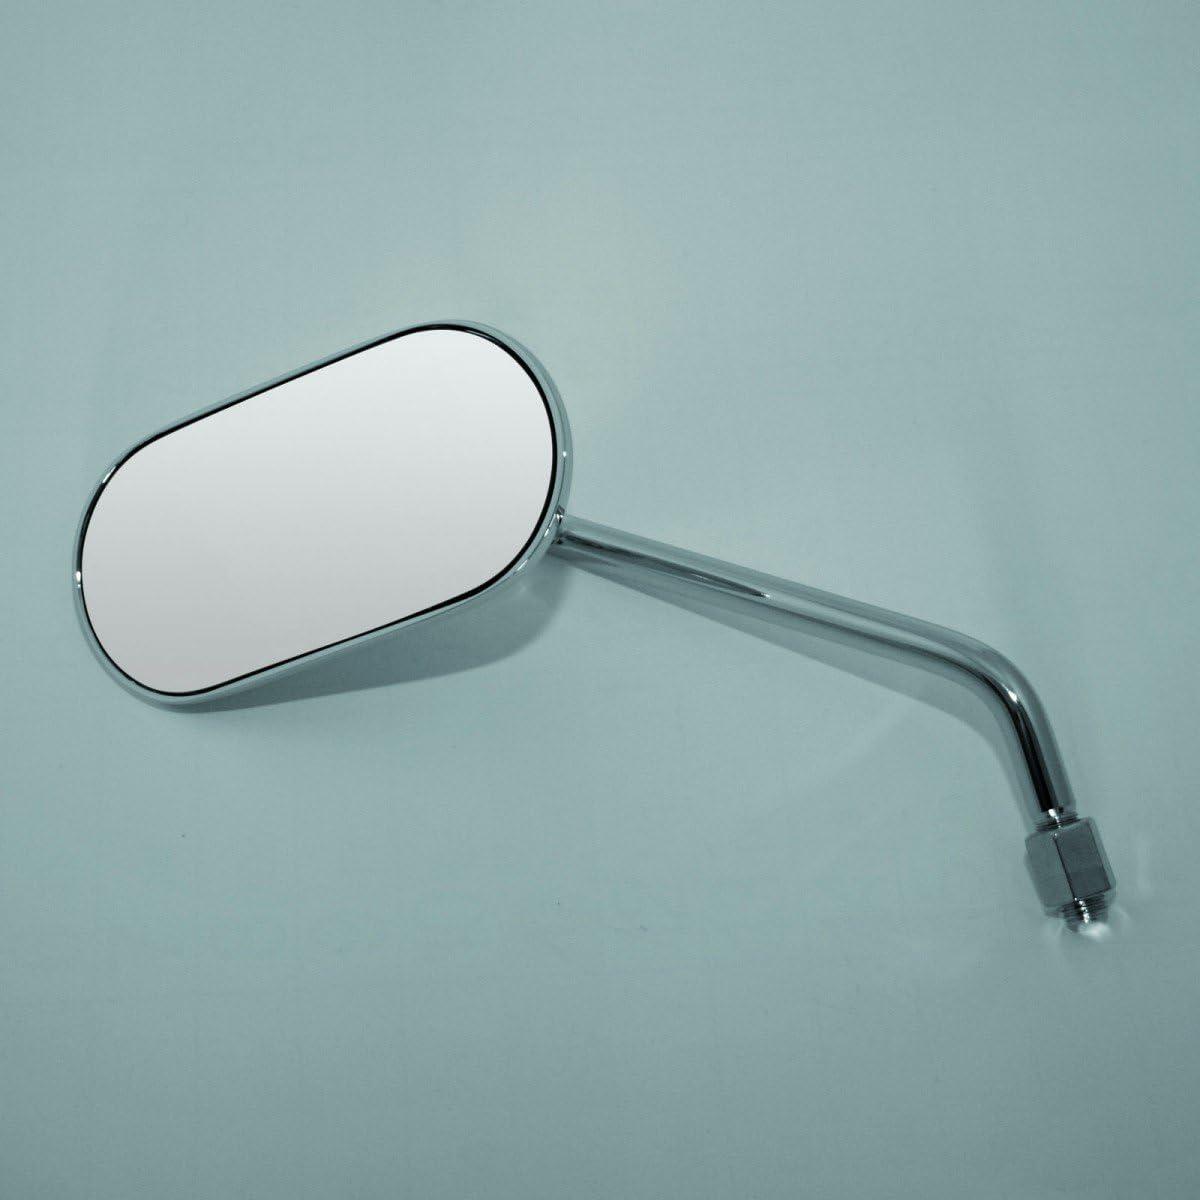 Spiegel AGILA Stahlstiel rechts 302-291 oval schwarz